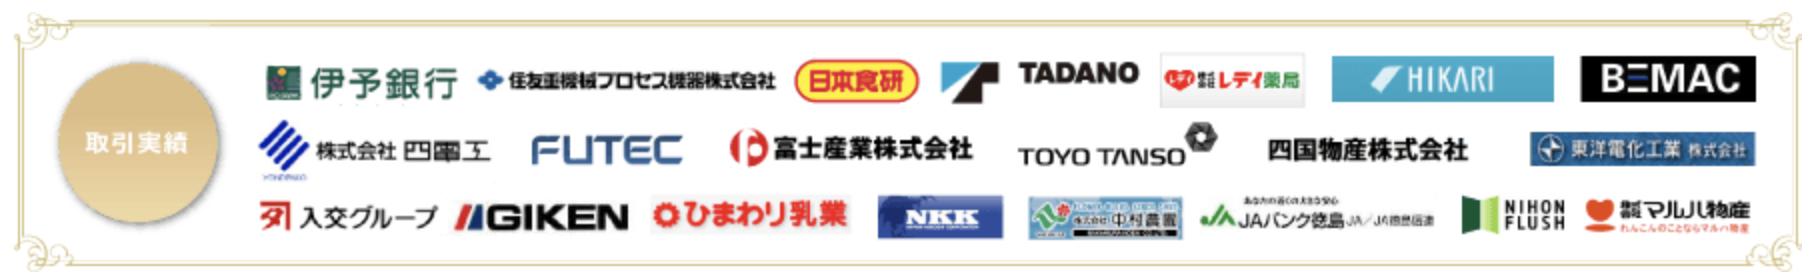 四国転職netの取引企業